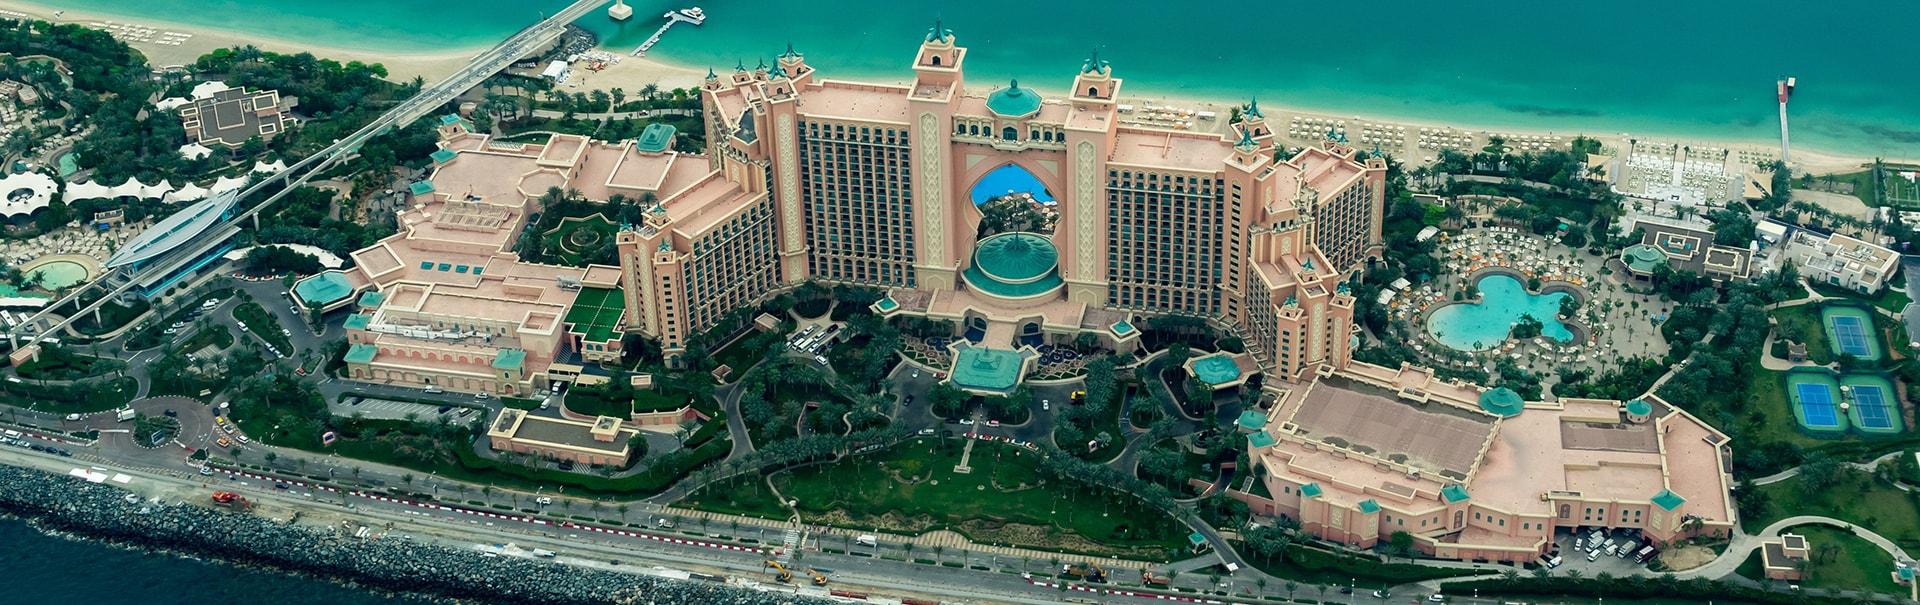 Dubai with Atlantis Stay (SHDZ3) Banner